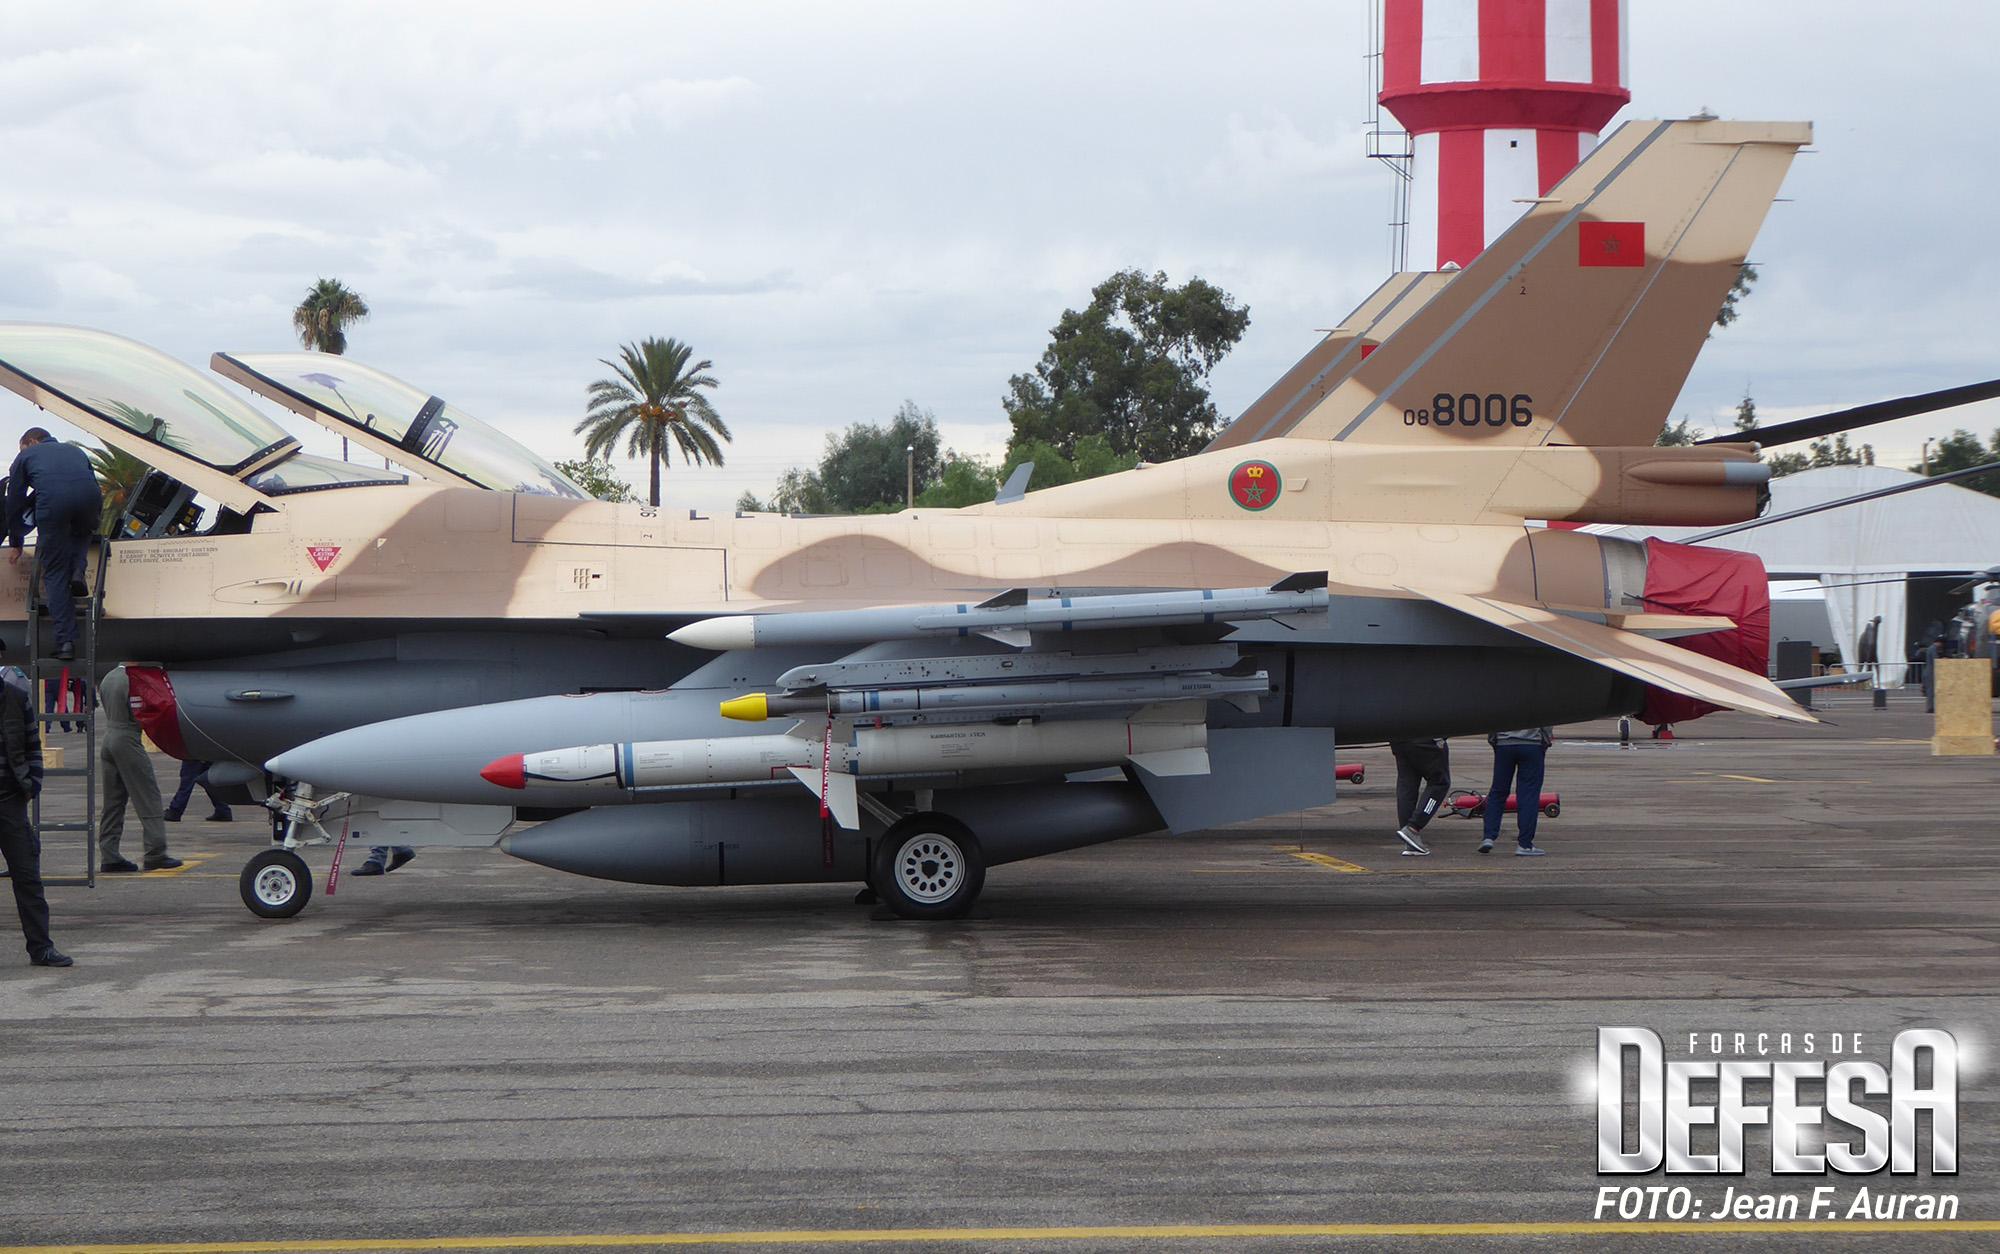 Photos RMAF F-16 C/D Block 52+ - Page 12 Armamament-F16